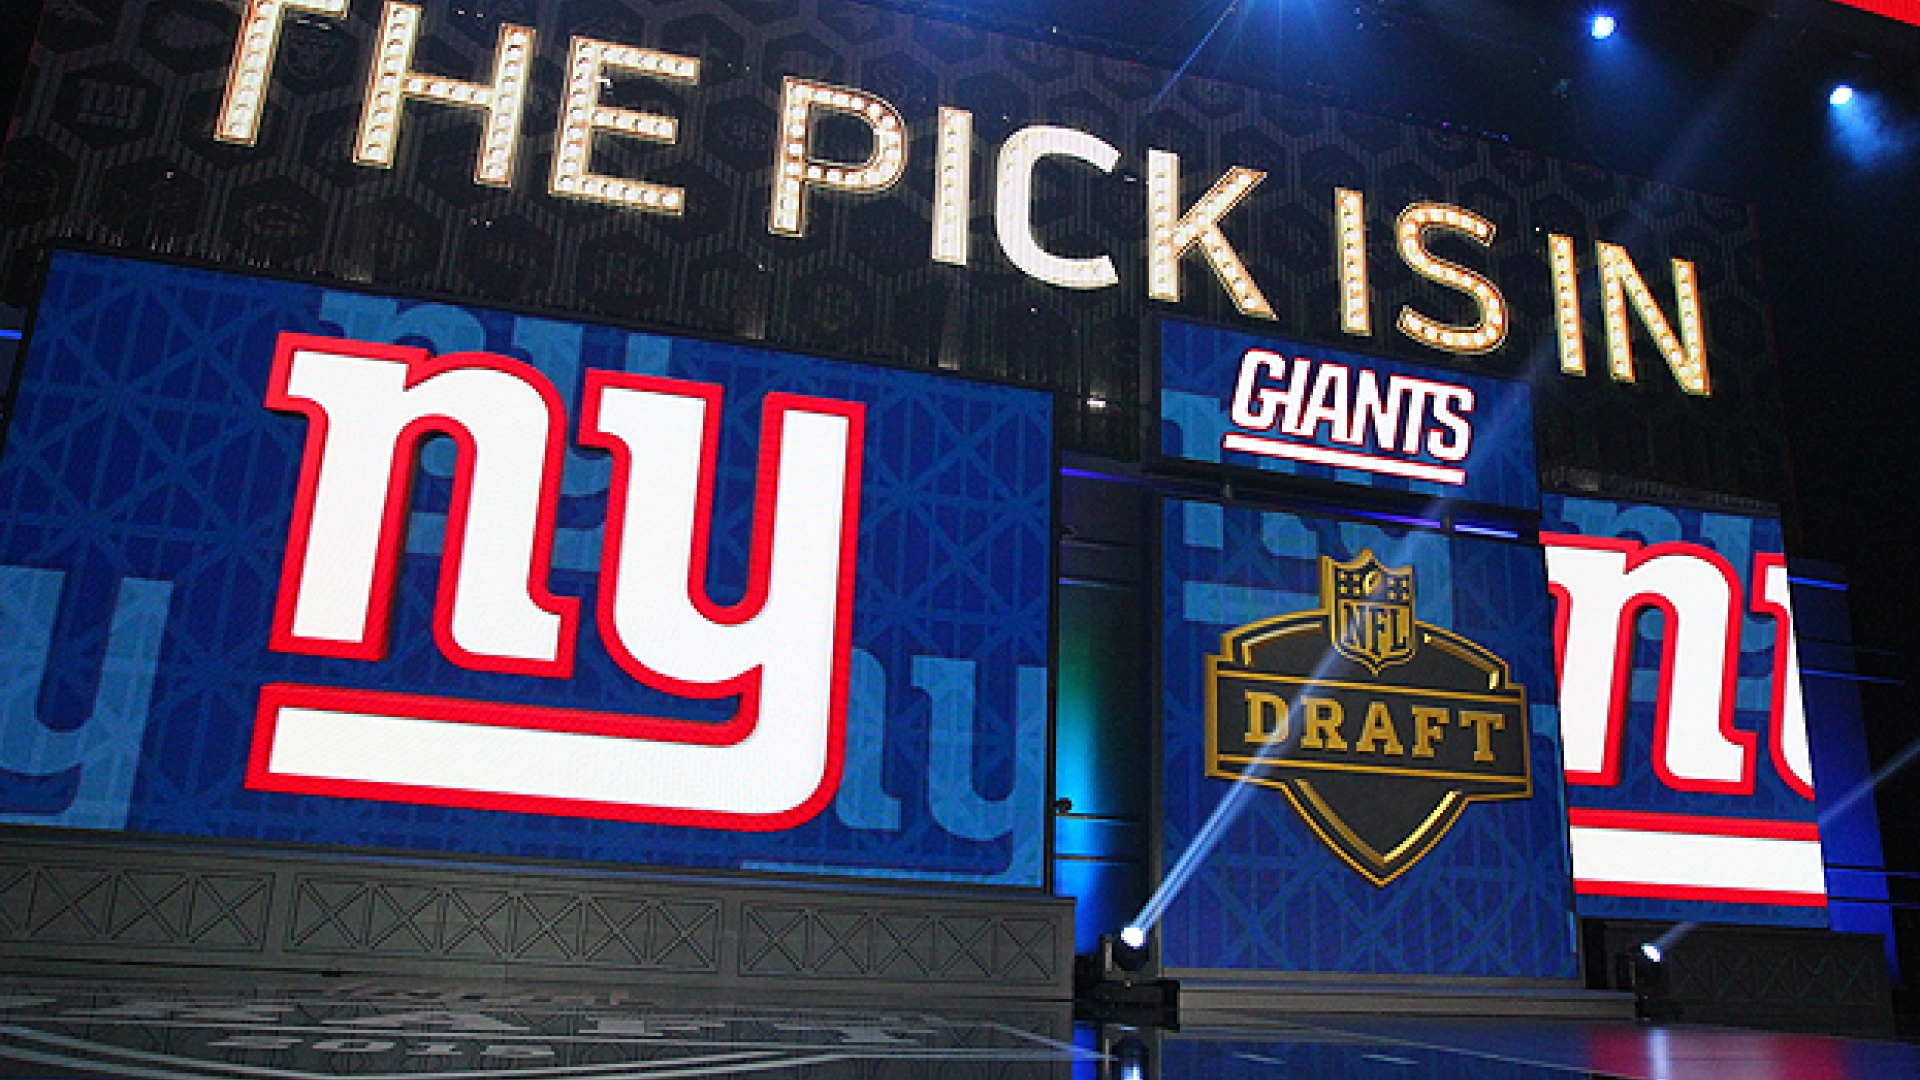 Repêchage de la NFL - Giants de New York